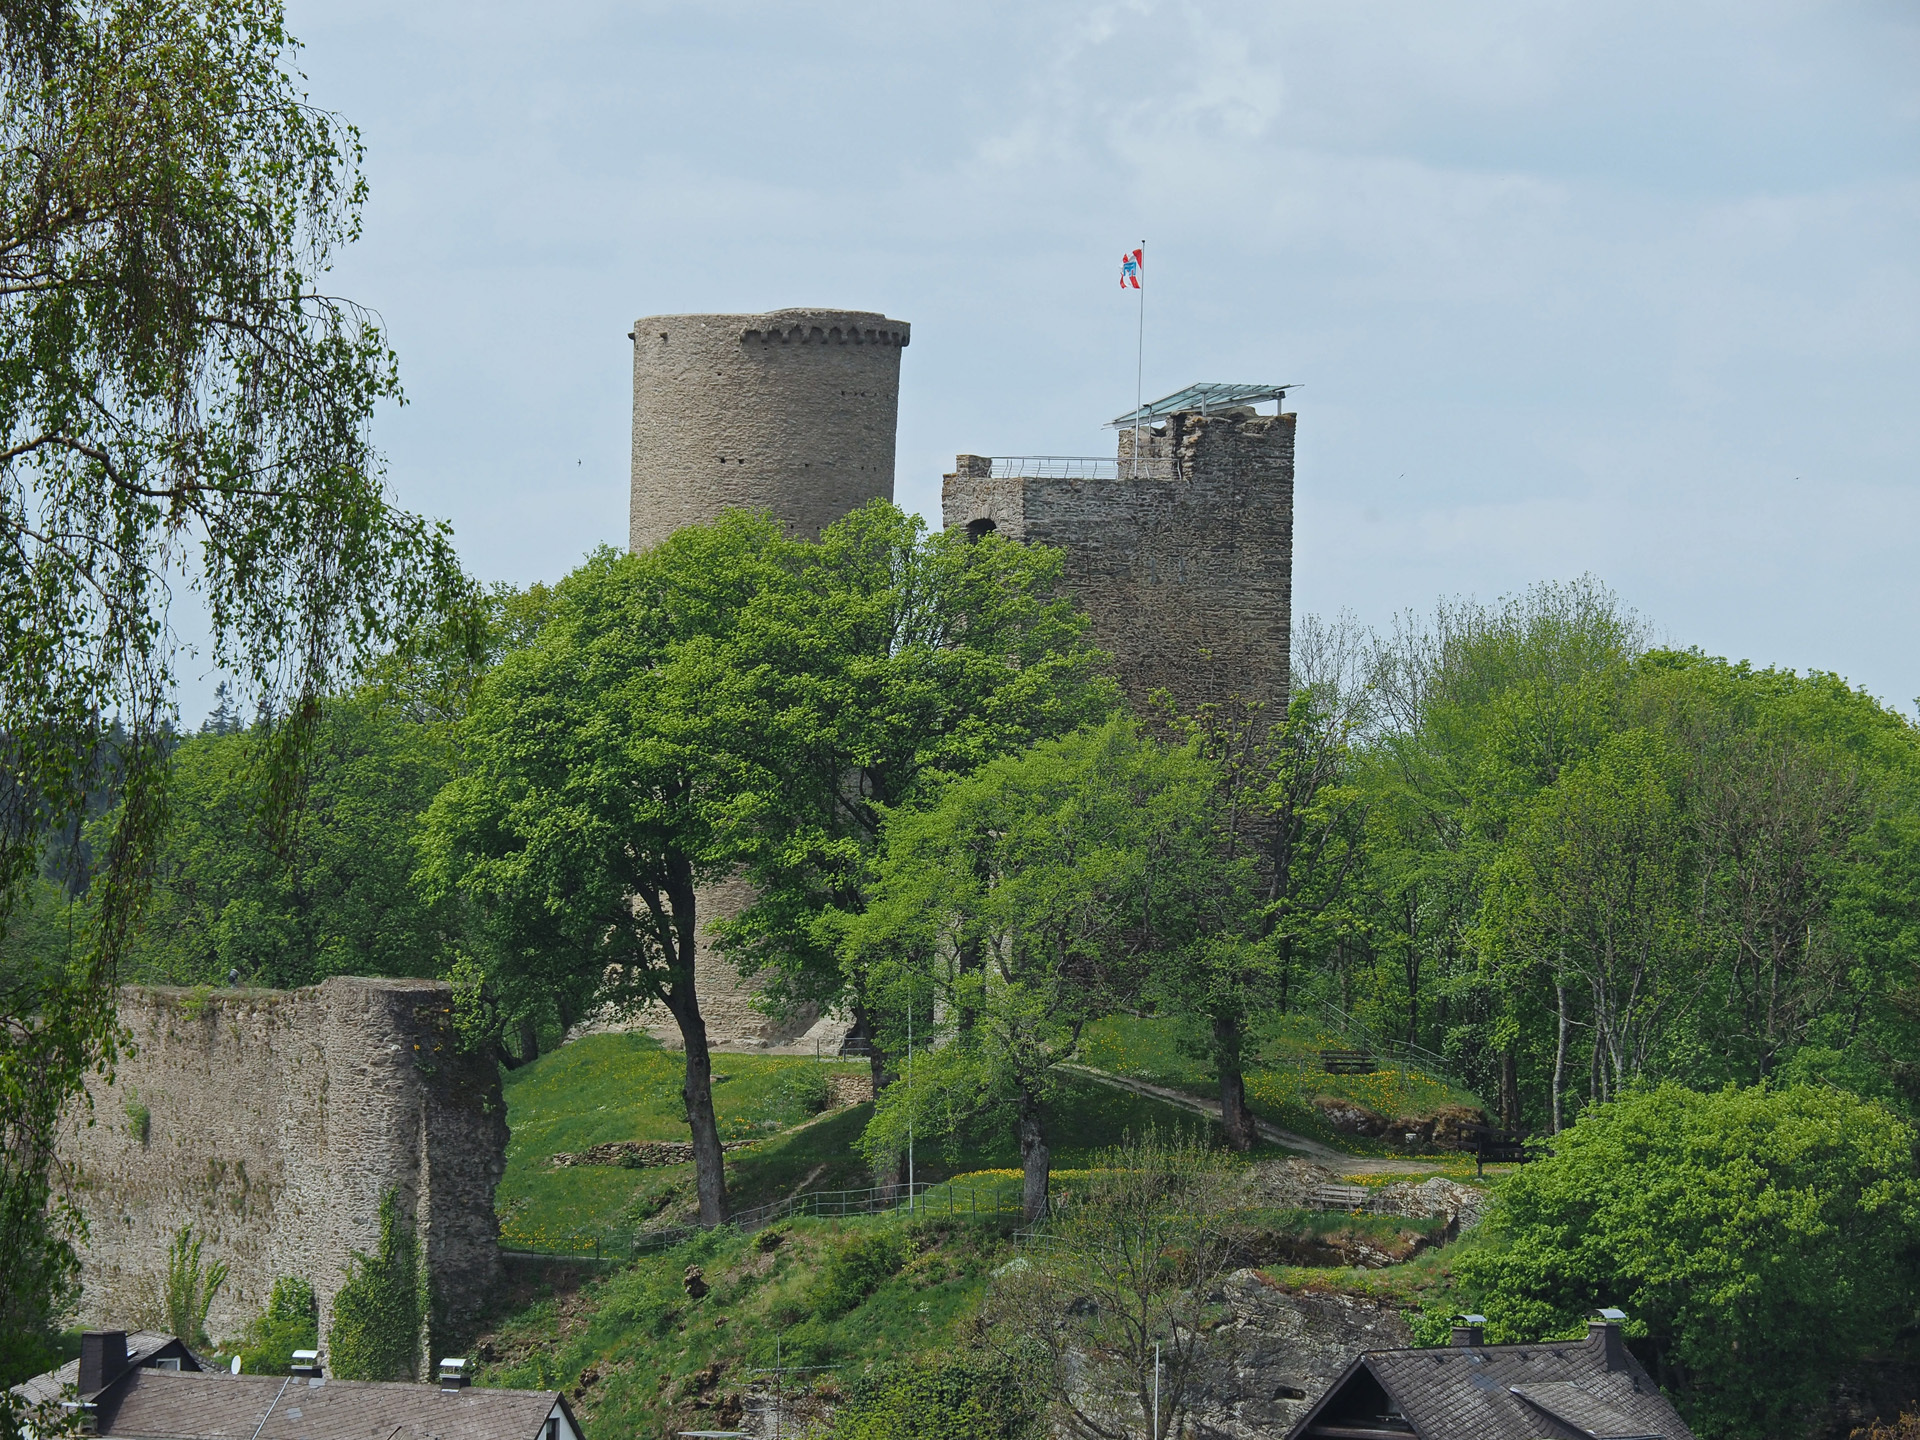 Burgruine Oberreifenberg